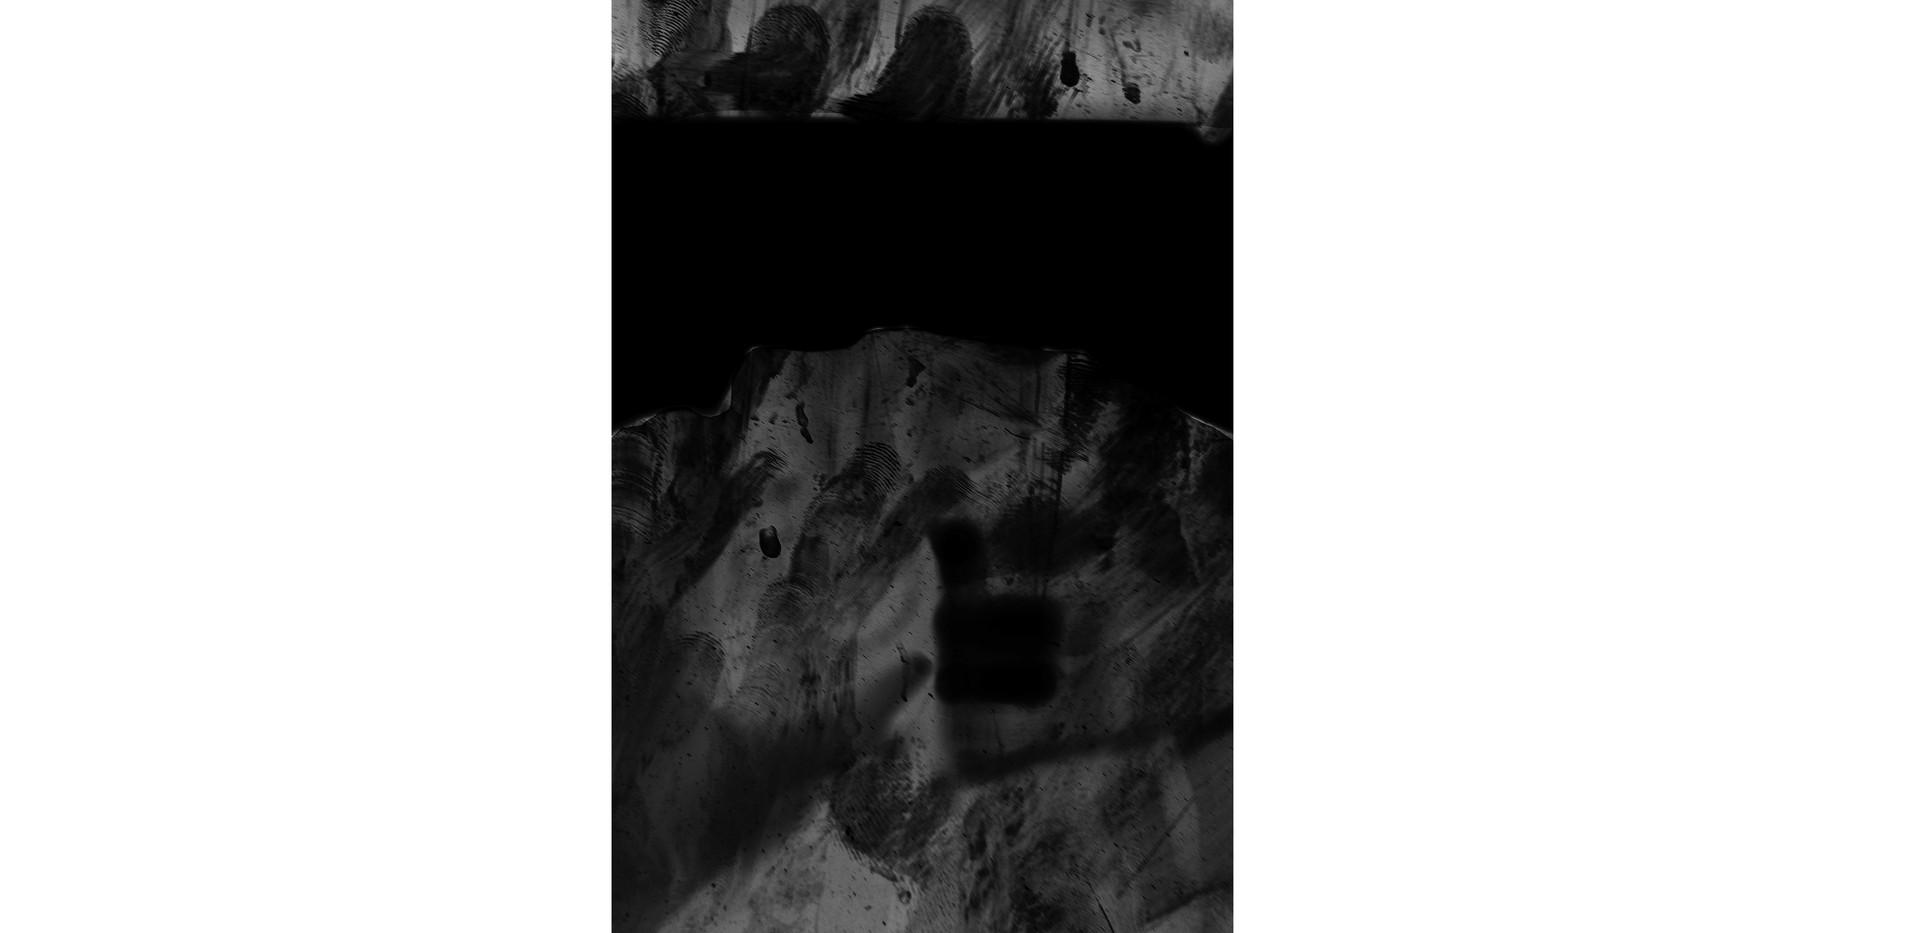 Imagen digitalizada